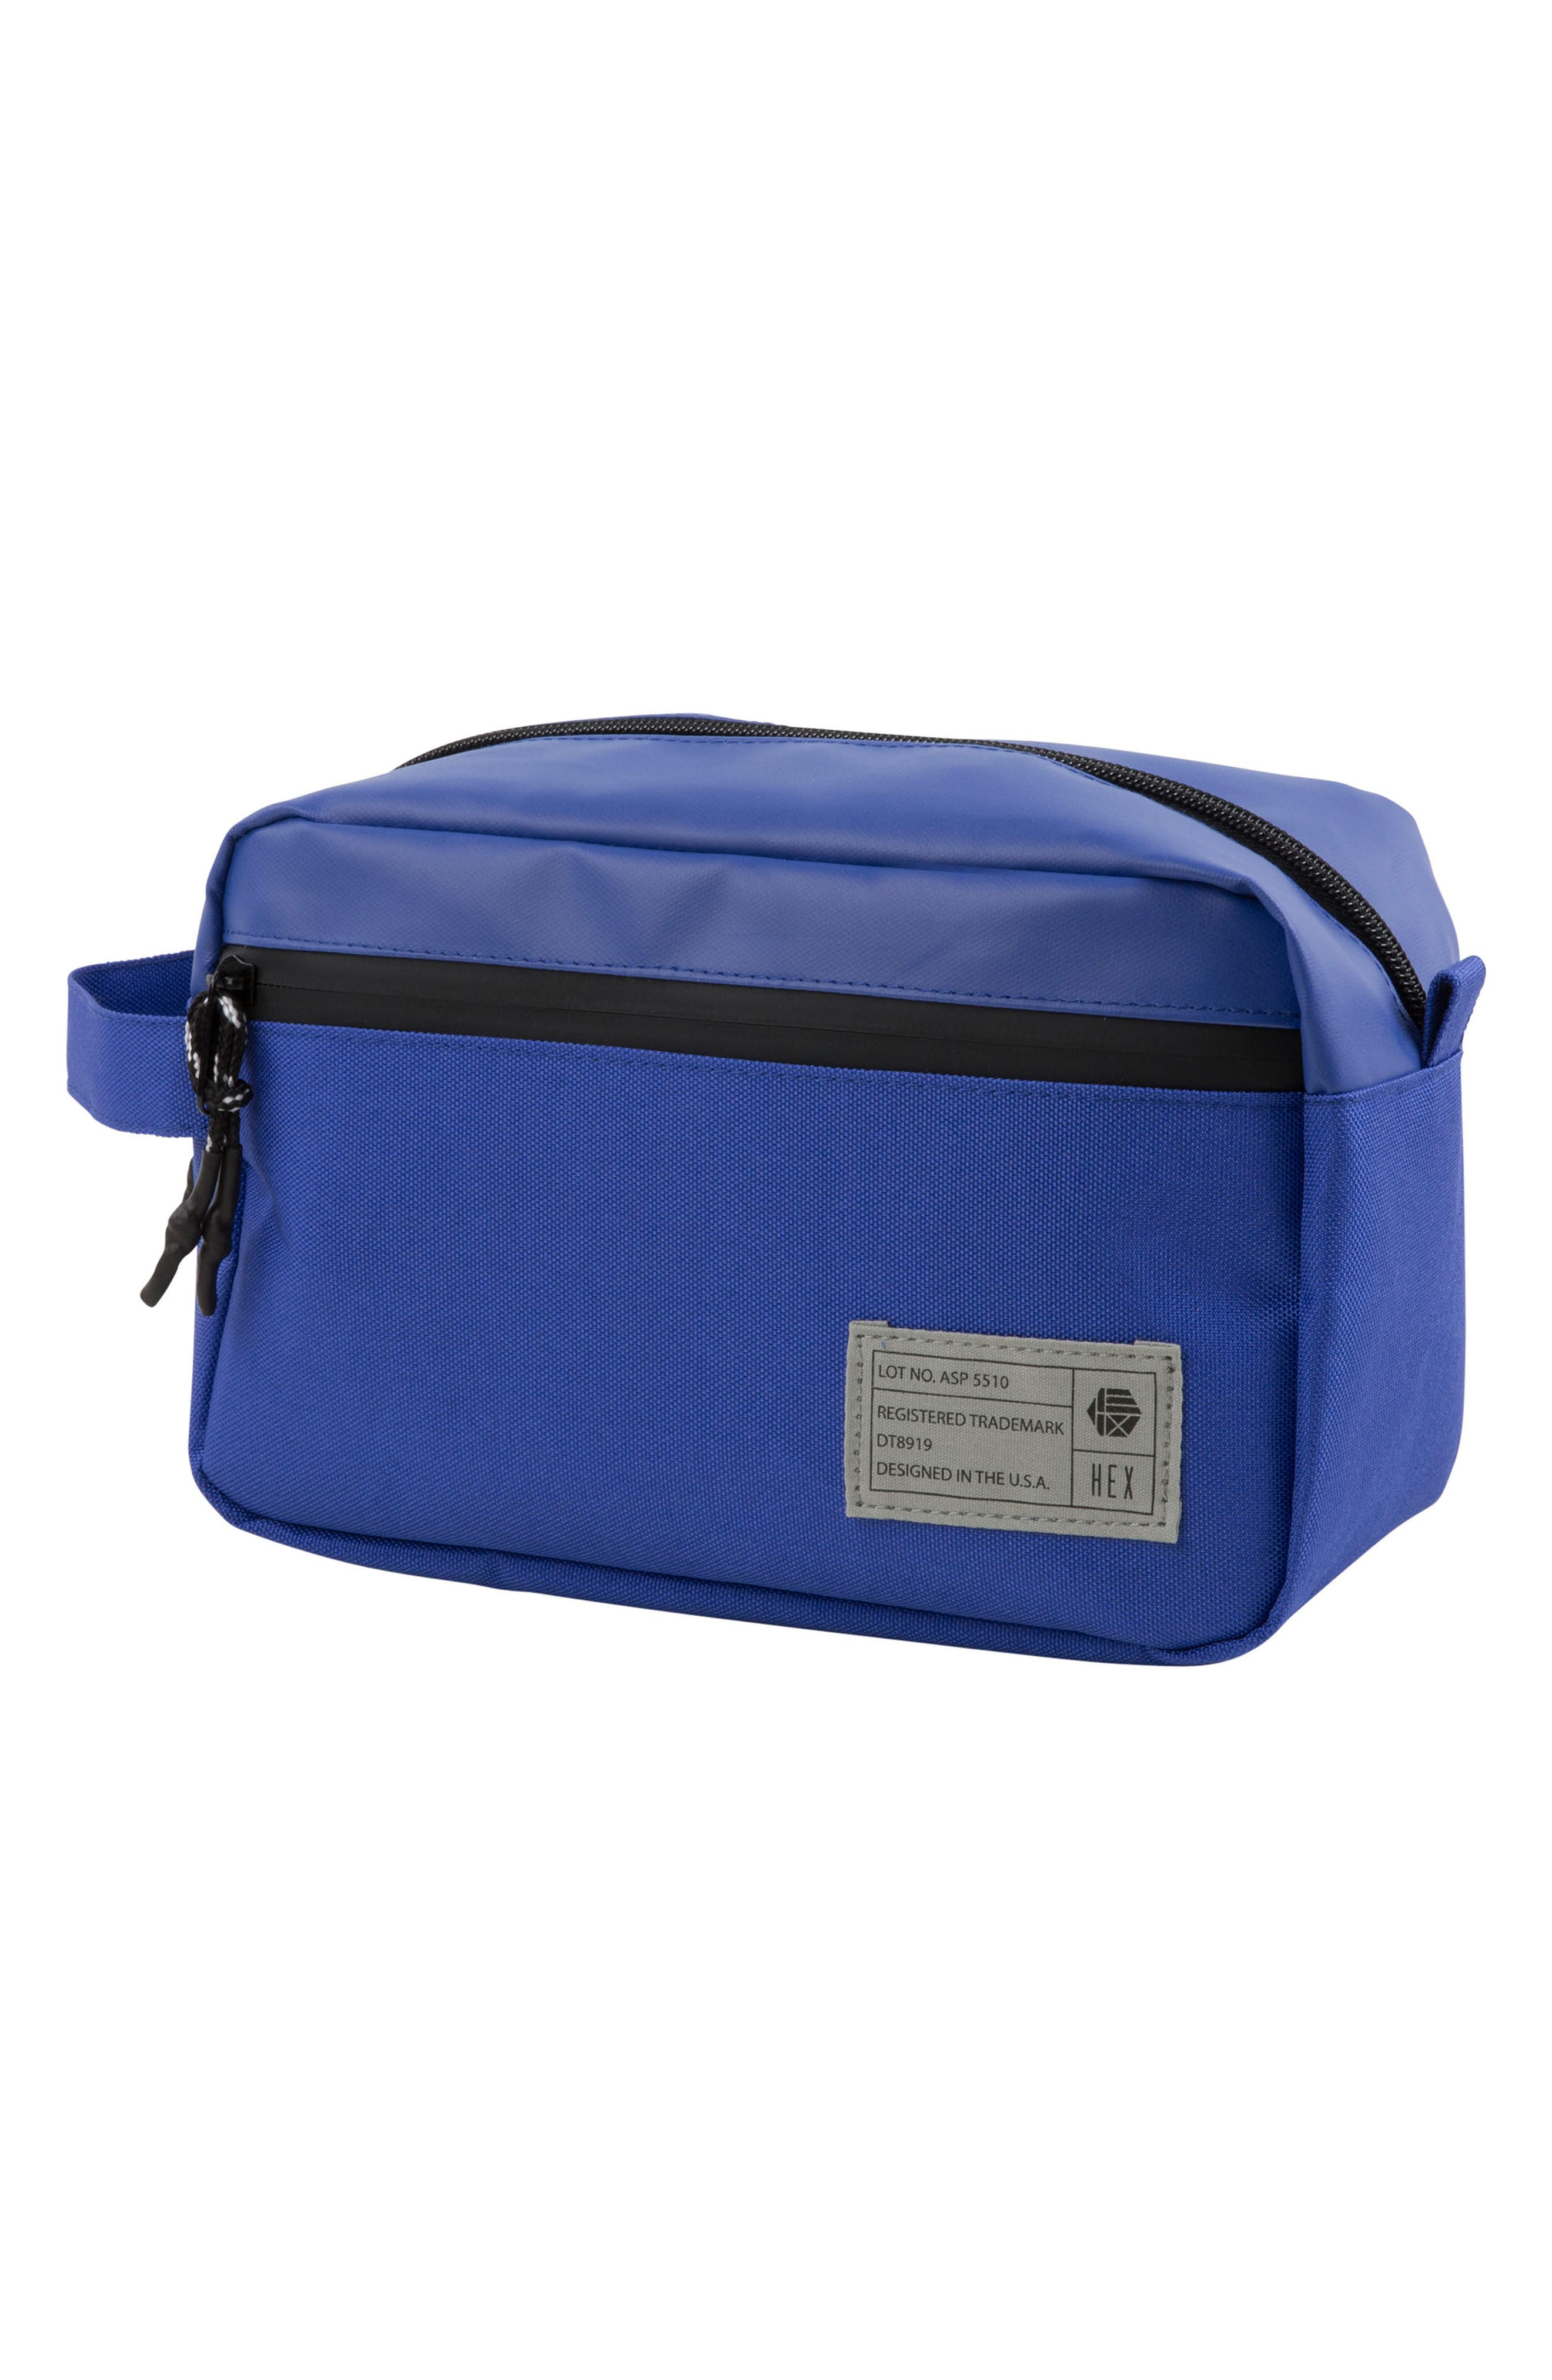 HEX Aspect Travel Kit